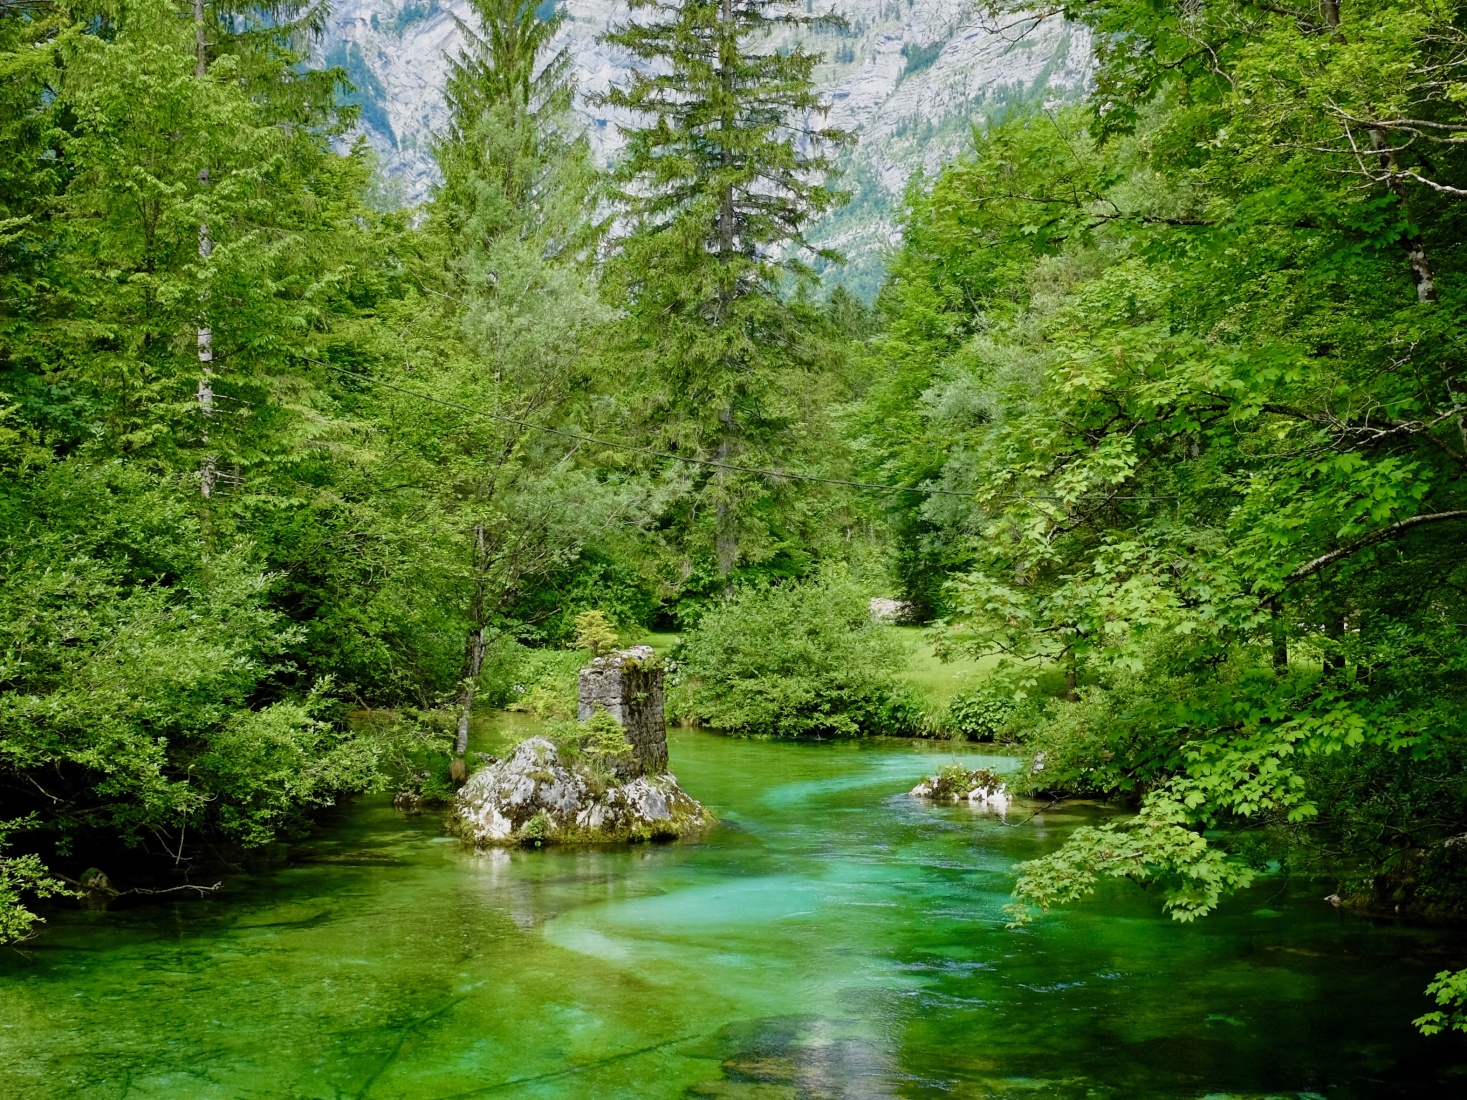 Sava Bohinjka river in Slovenia, on the western end of Lake Bohinj.